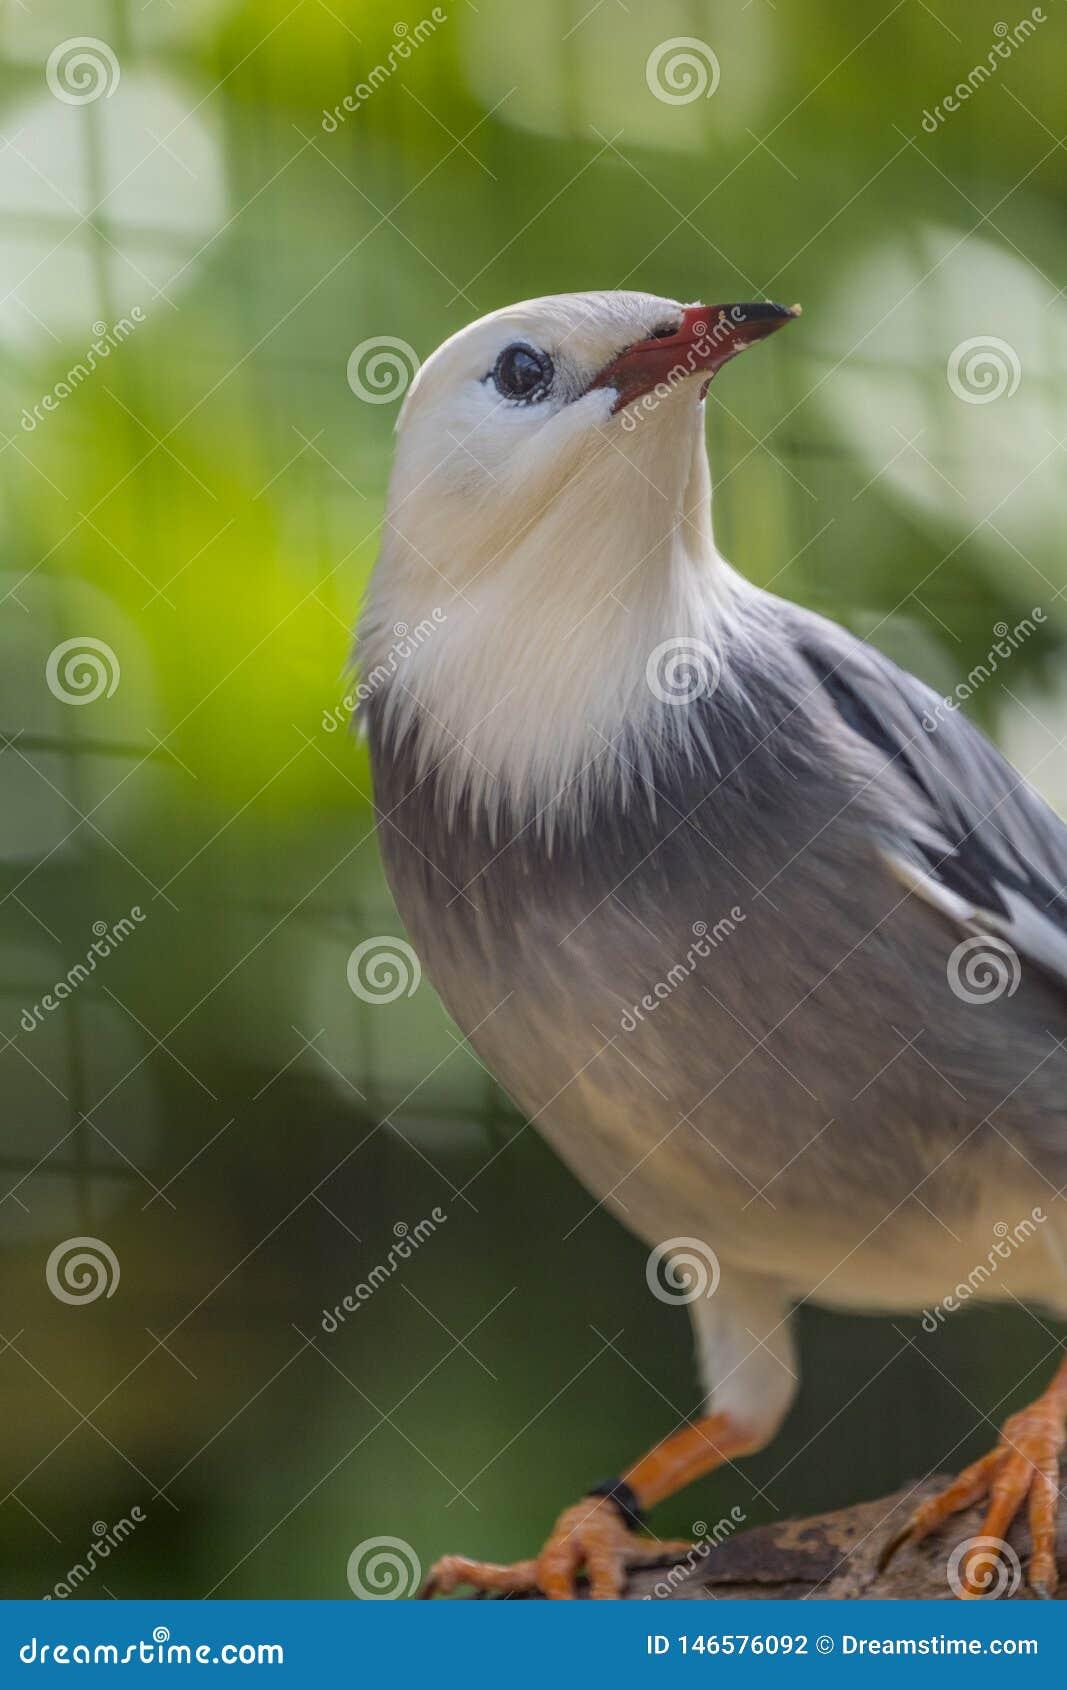 Red Billed Starling Bird With Red Beak